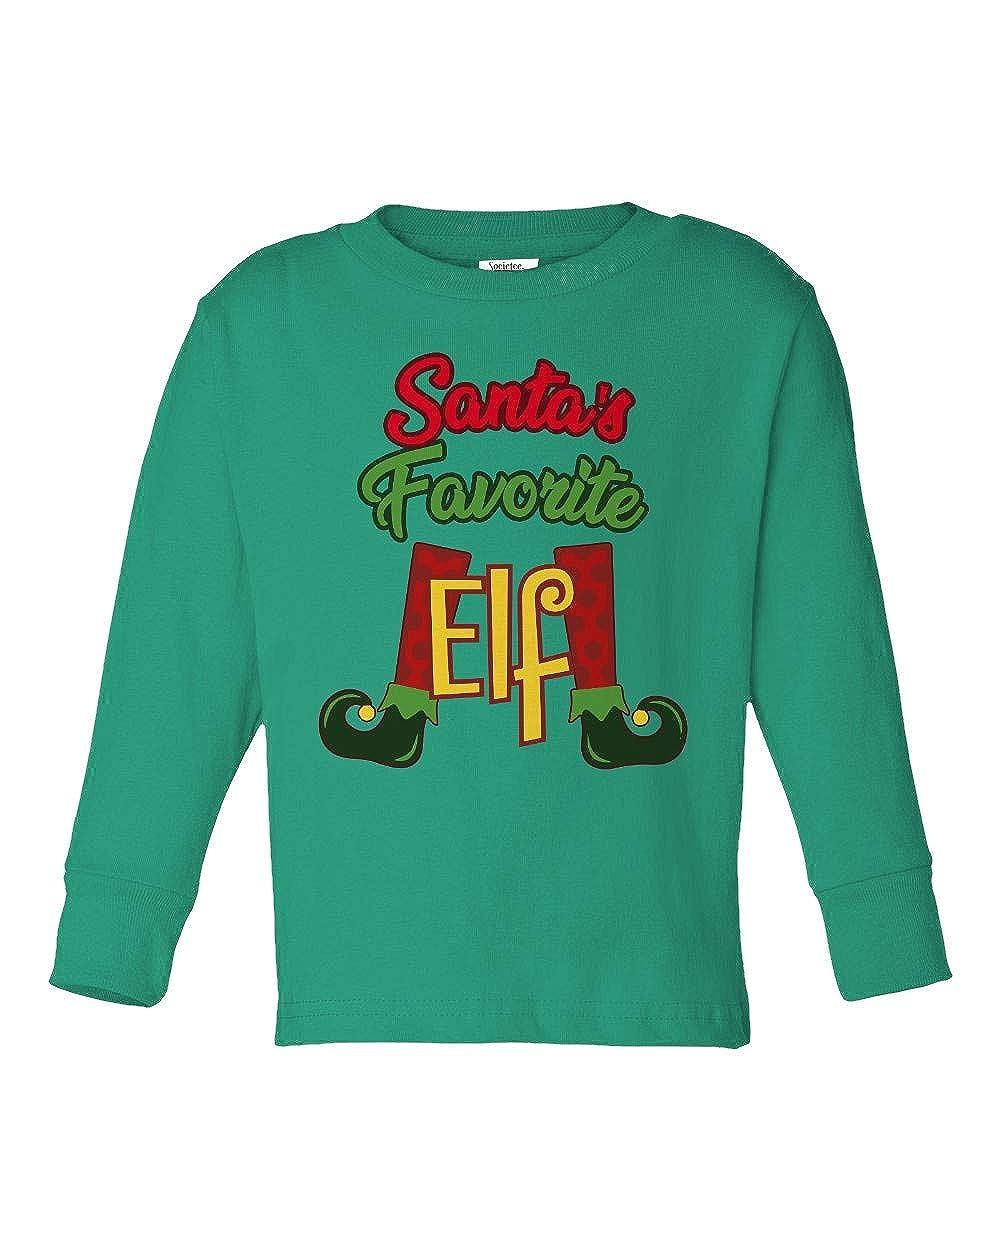 Societee Santas Favorite Elf Girls Boys Toddler Long Sleeve T-Shirt